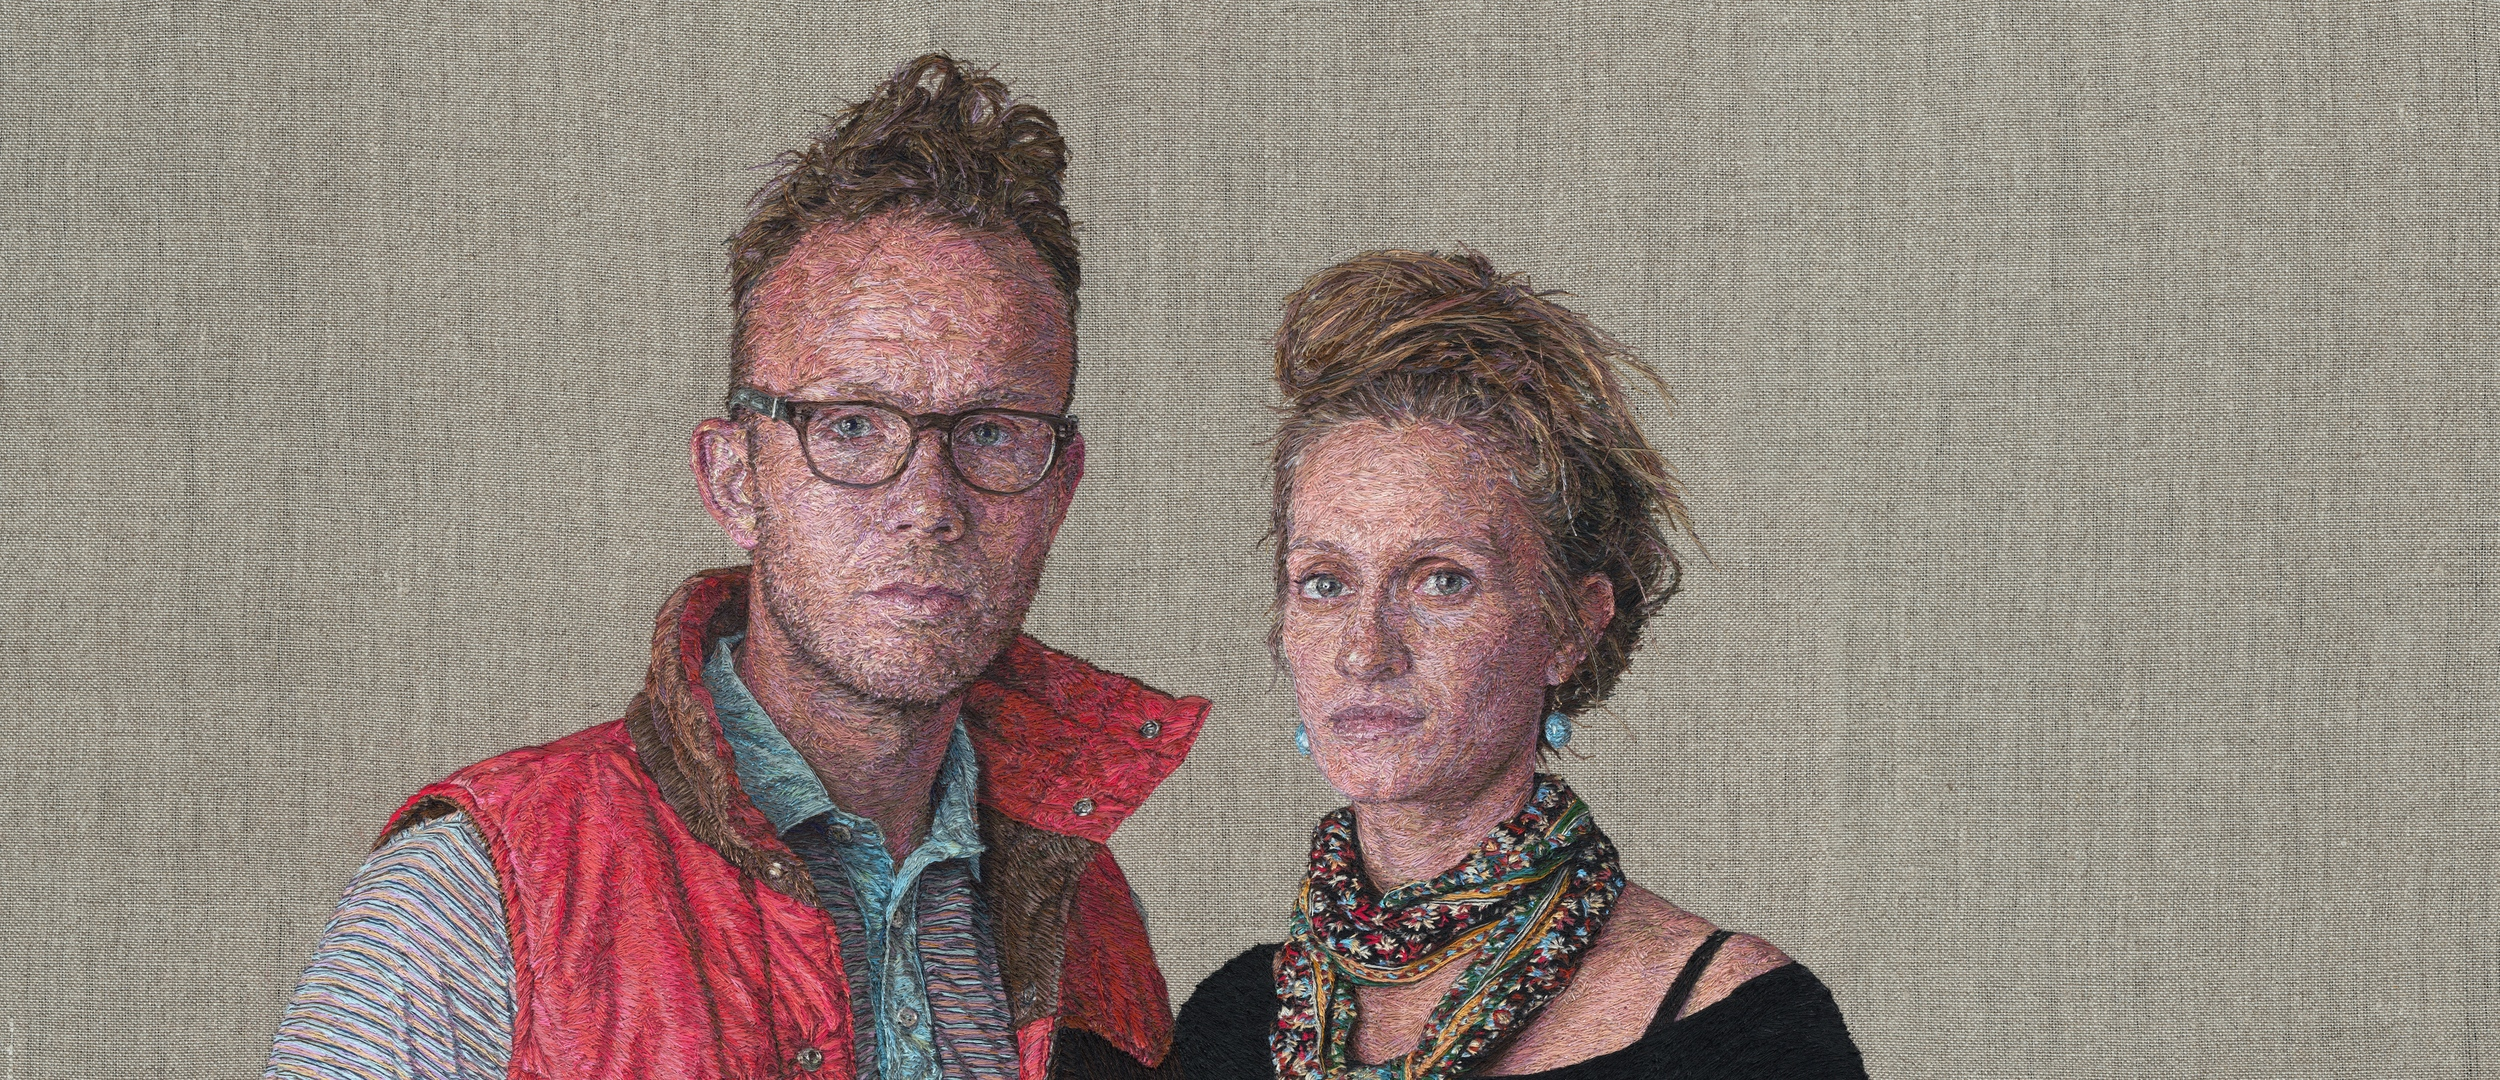 Astounding Photorealistic Portraits Embroidered By Fiber Artist Cayce Zavaglia